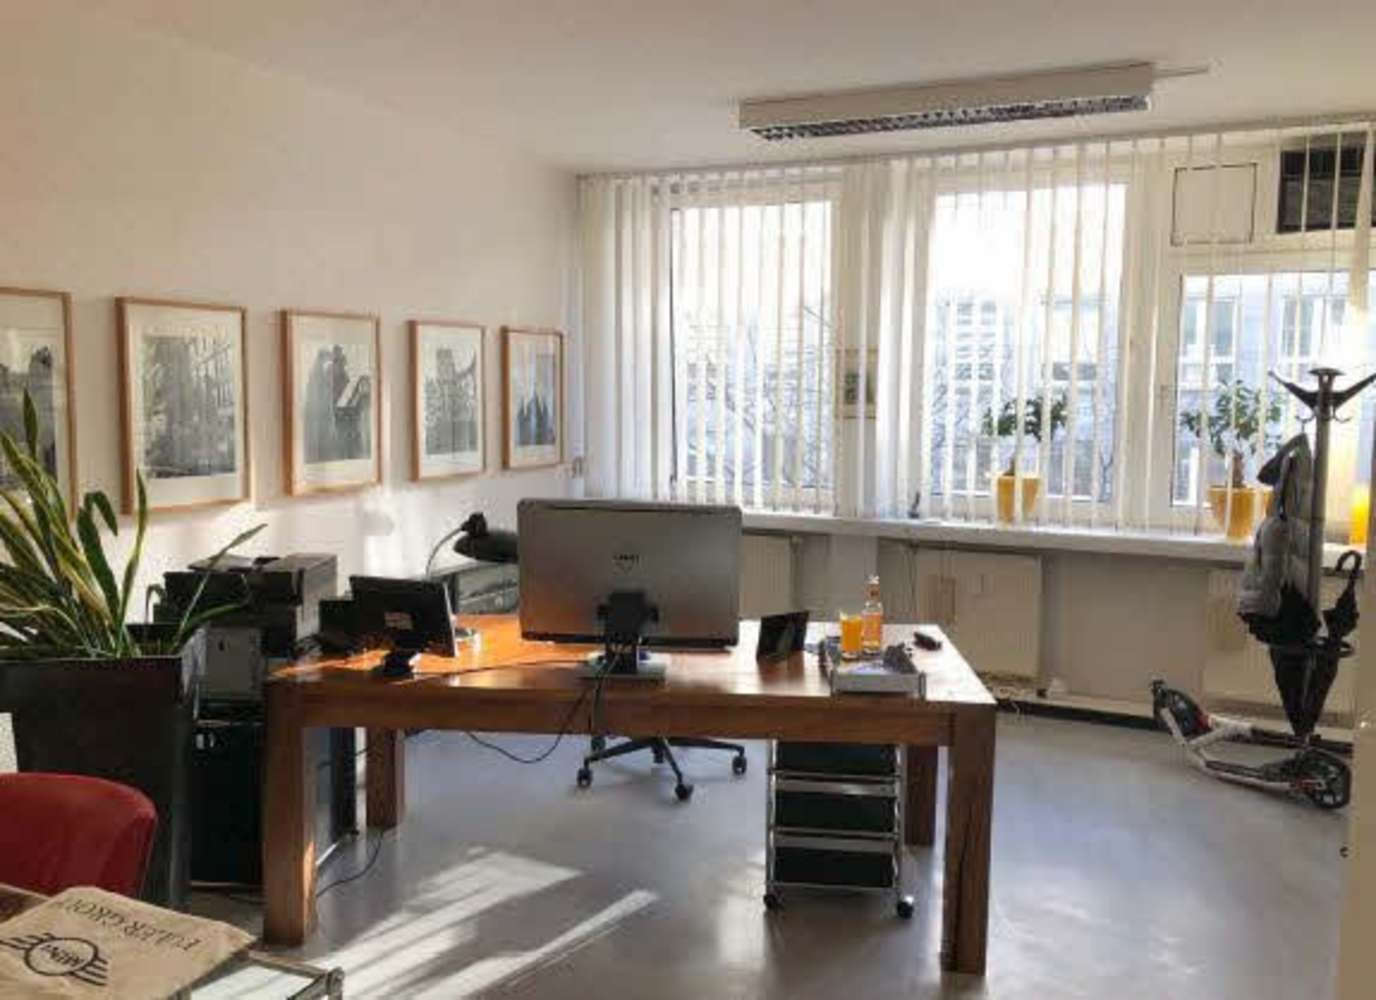 Büros Frankfurt am main, 60311 - Büro - Frankfurt am Main - F2602 - 10020786